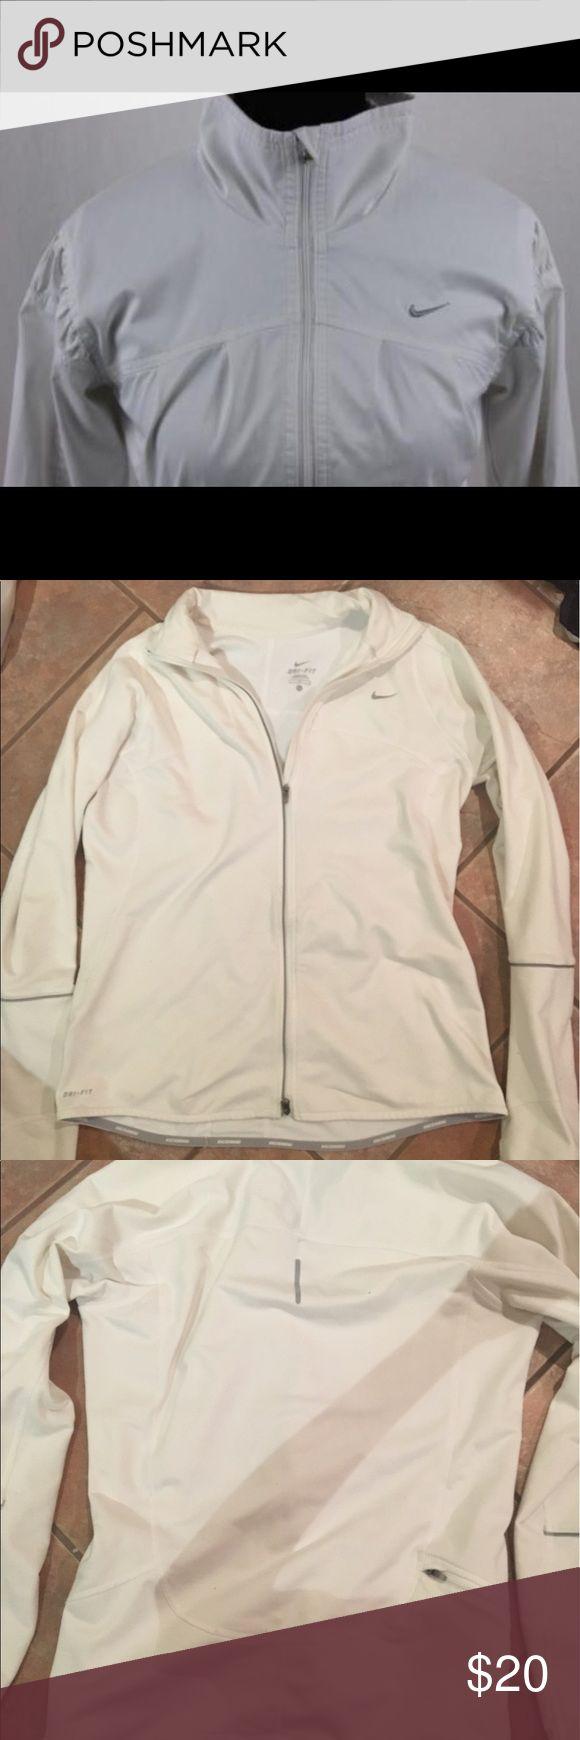 White zip up Nike running jacket White zip up running jacket by Nike Nike Jackets & Coats Utility Jackets